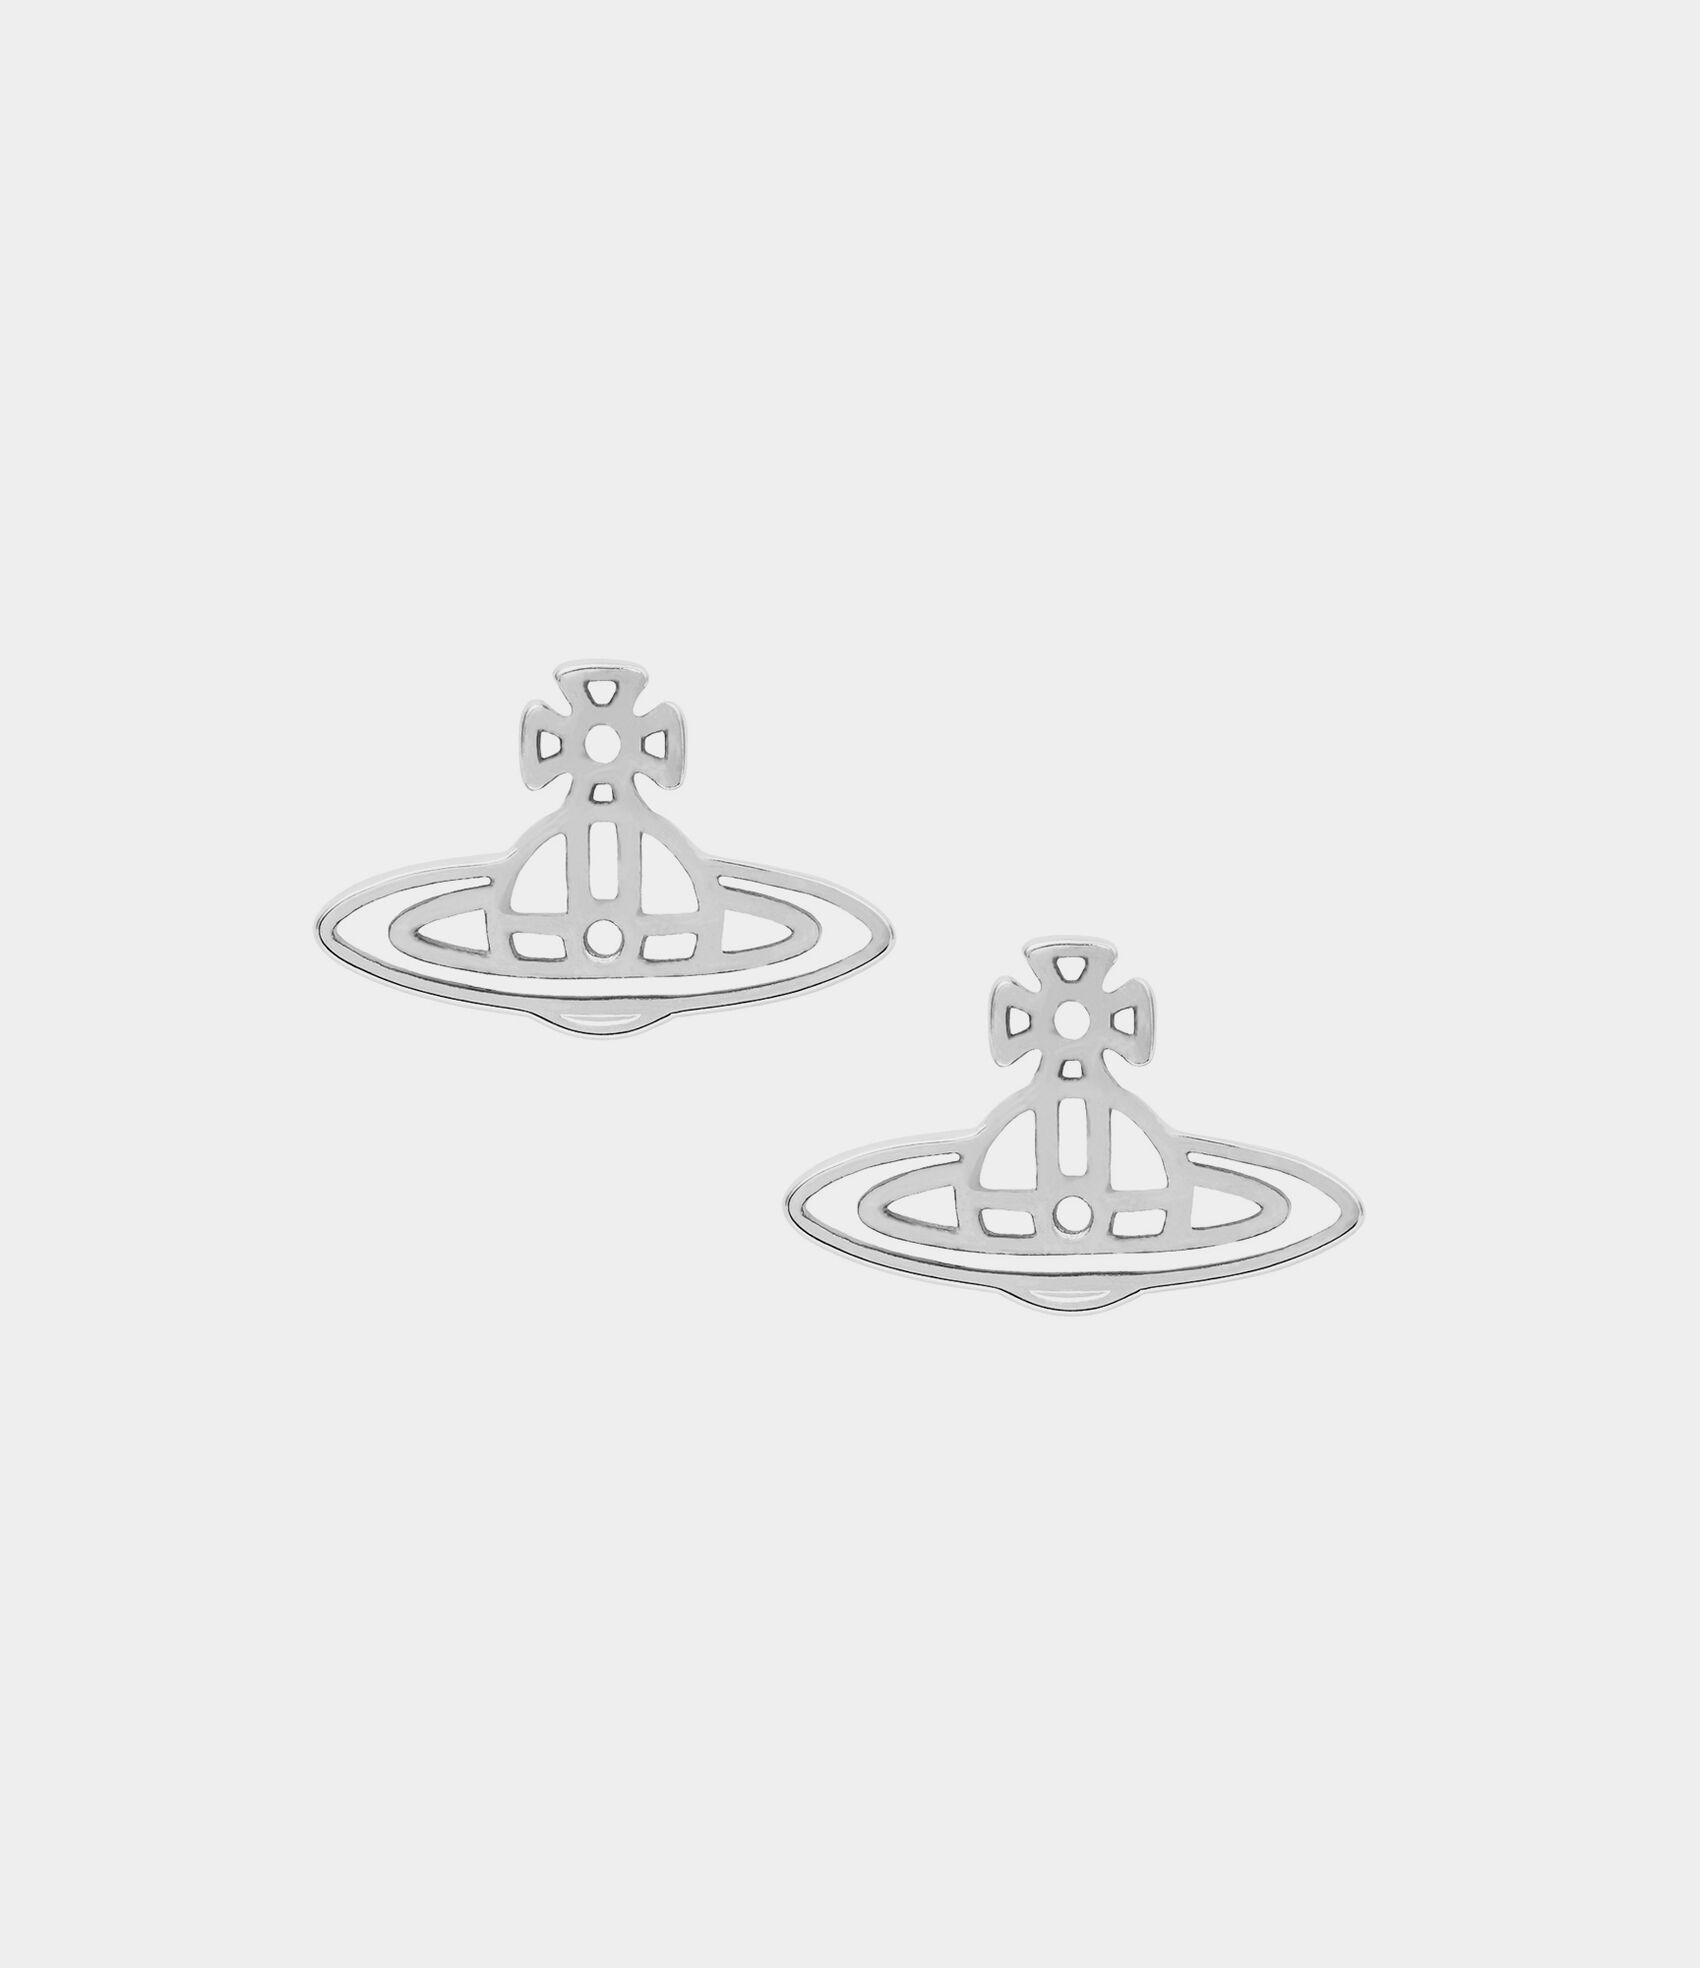 194817905 Thin Lines Flat Orb Stud Earrings | Women's Earrings | Vivienne Westwood